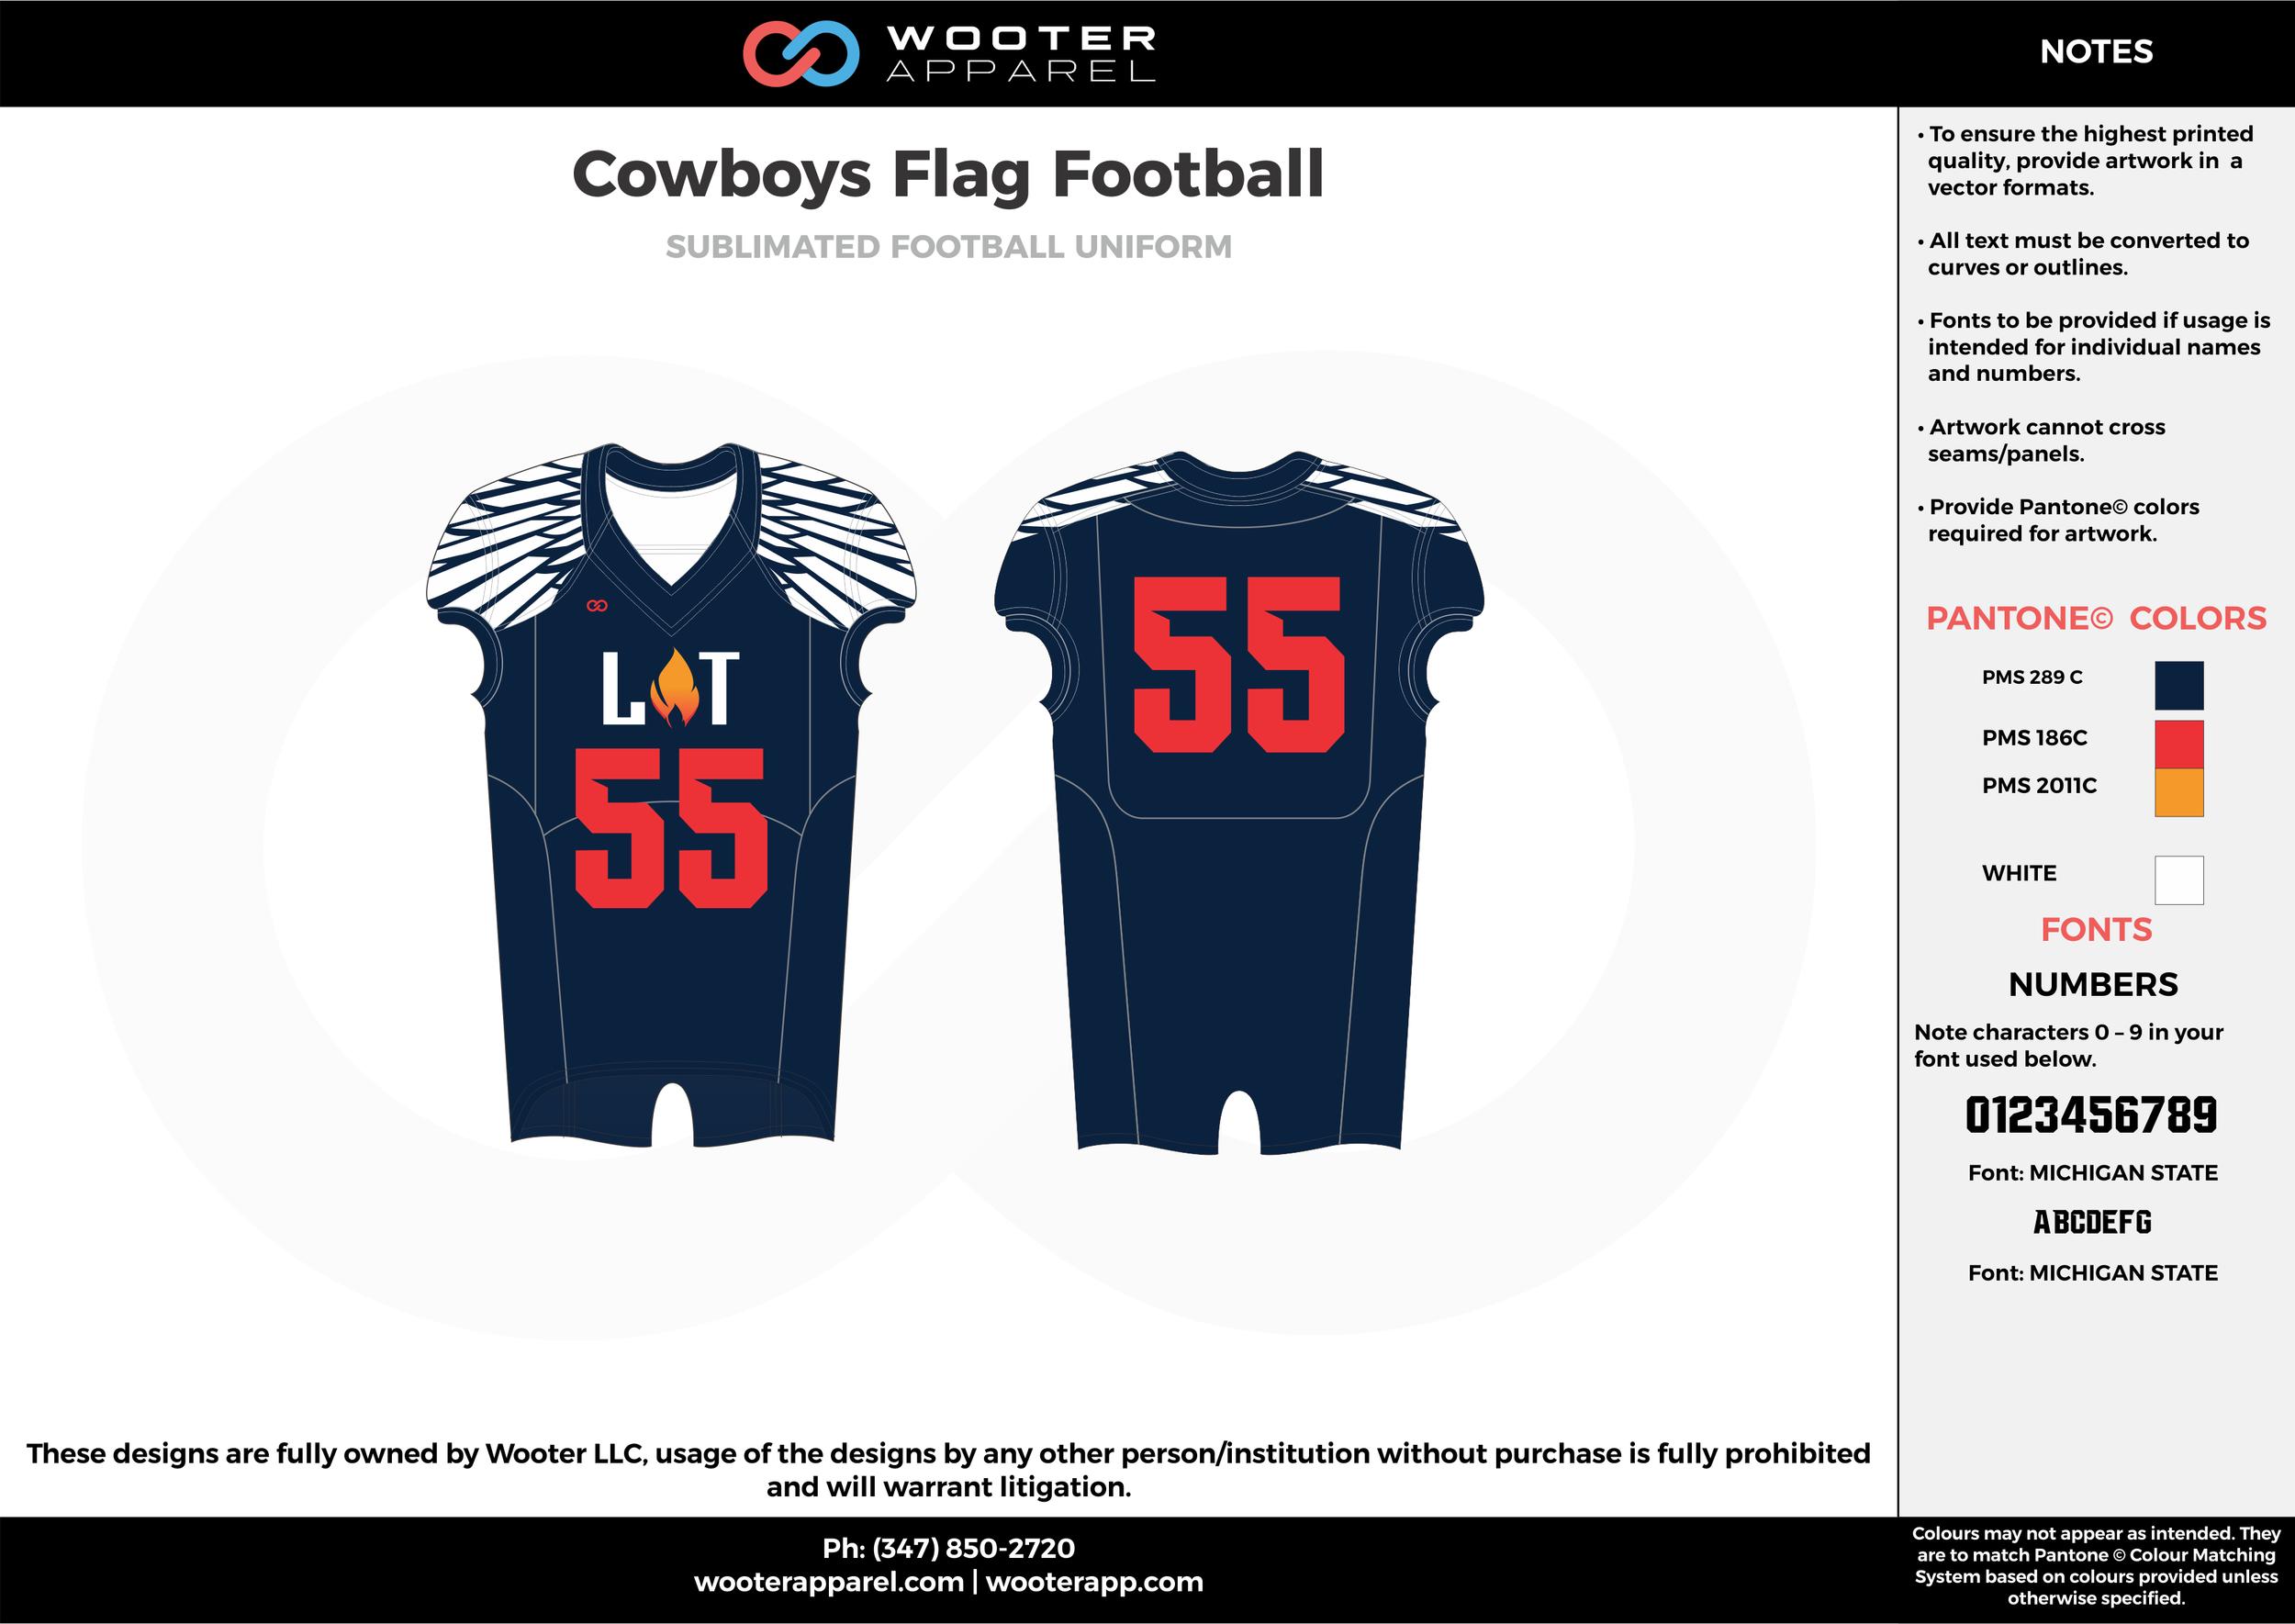 COWBOYS Flag Football navy blue red white flag football uniforms jerseys top